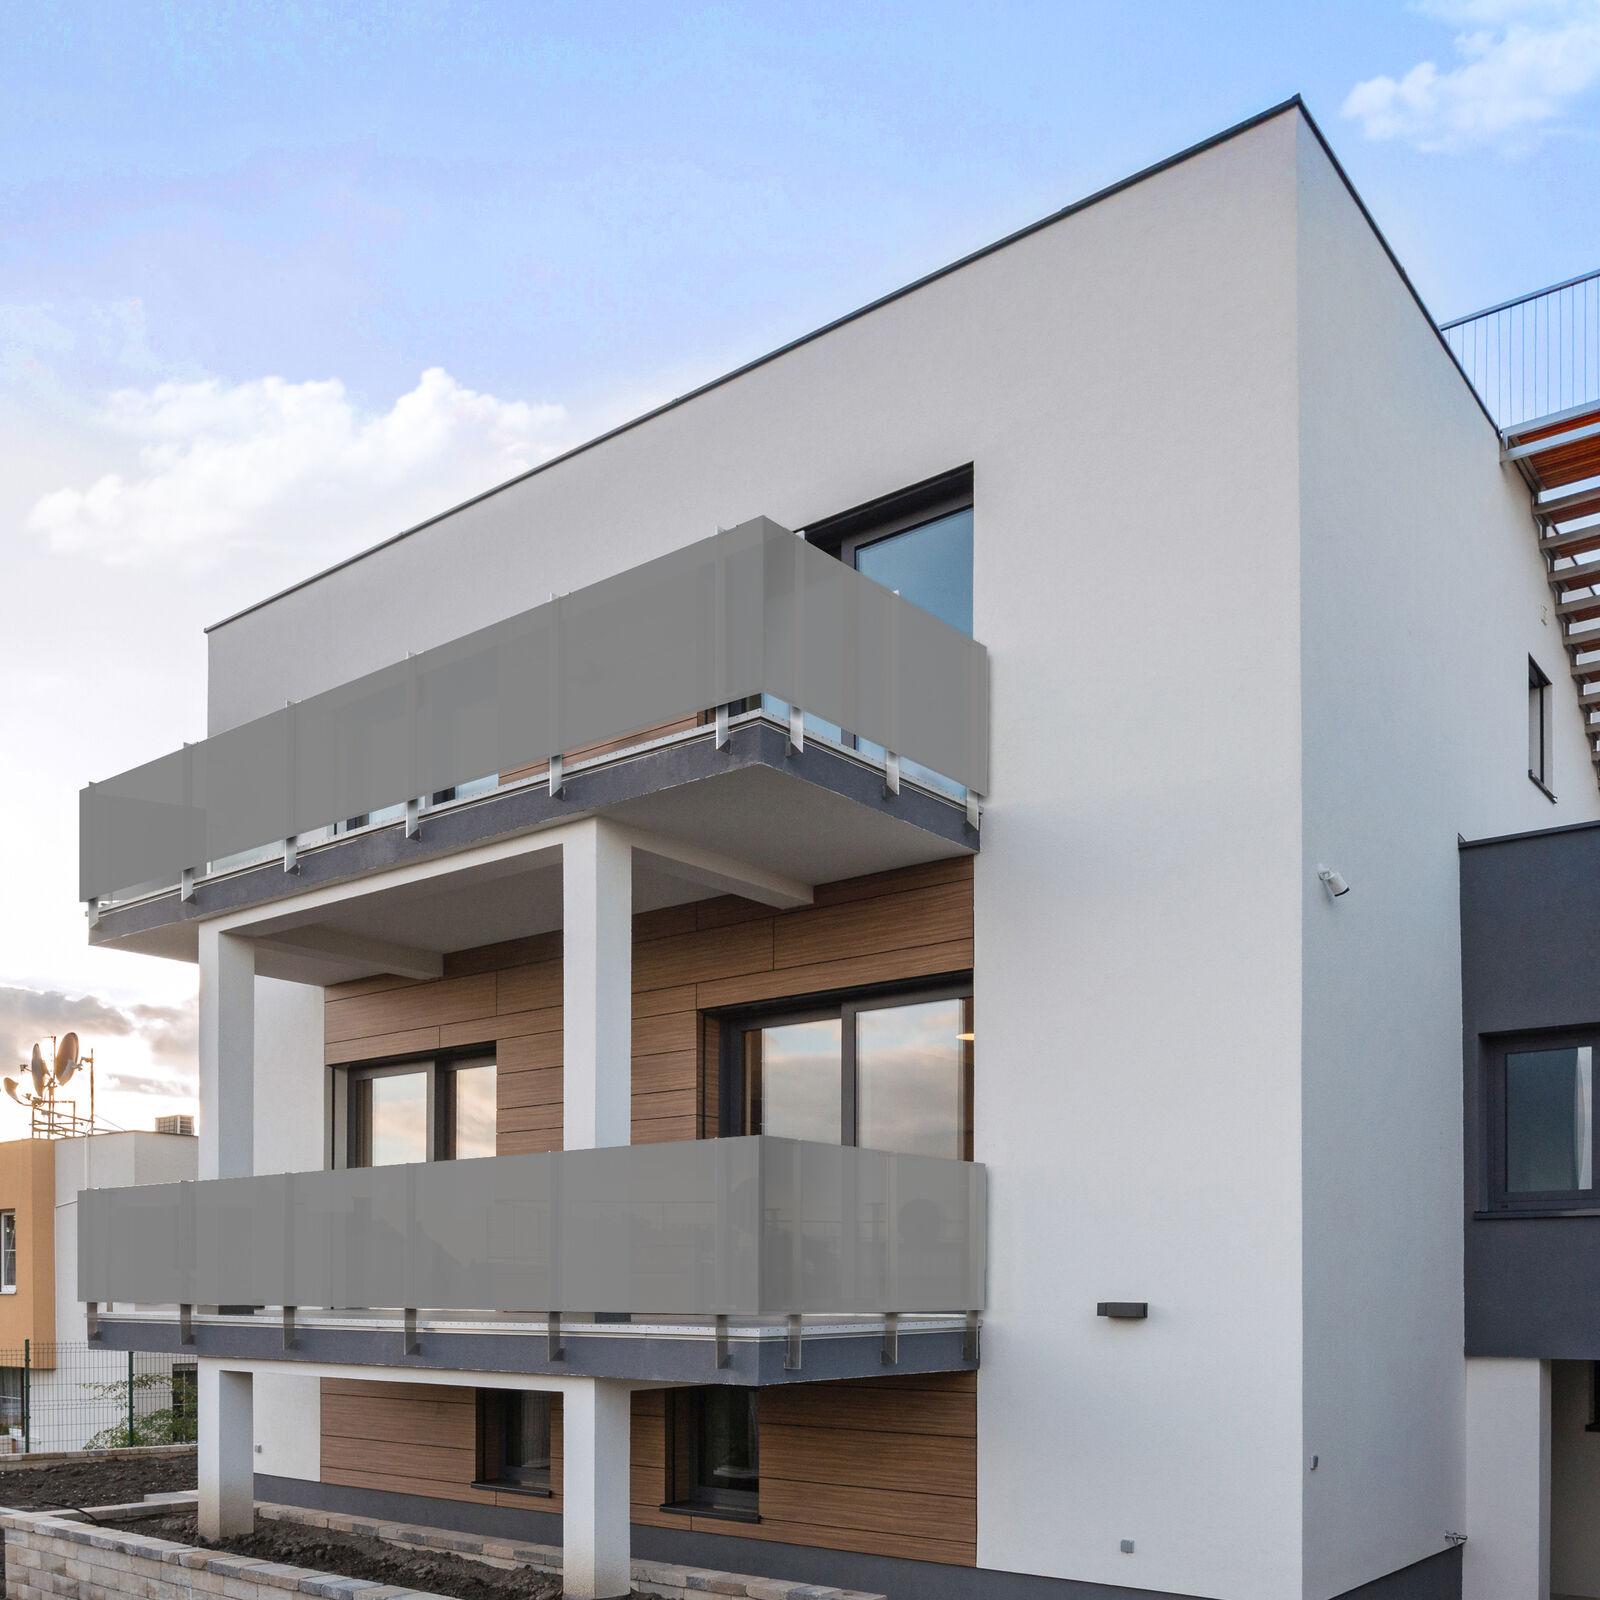 Balkon Sichtschutz Balkonsichtschutz Balkonbespannung